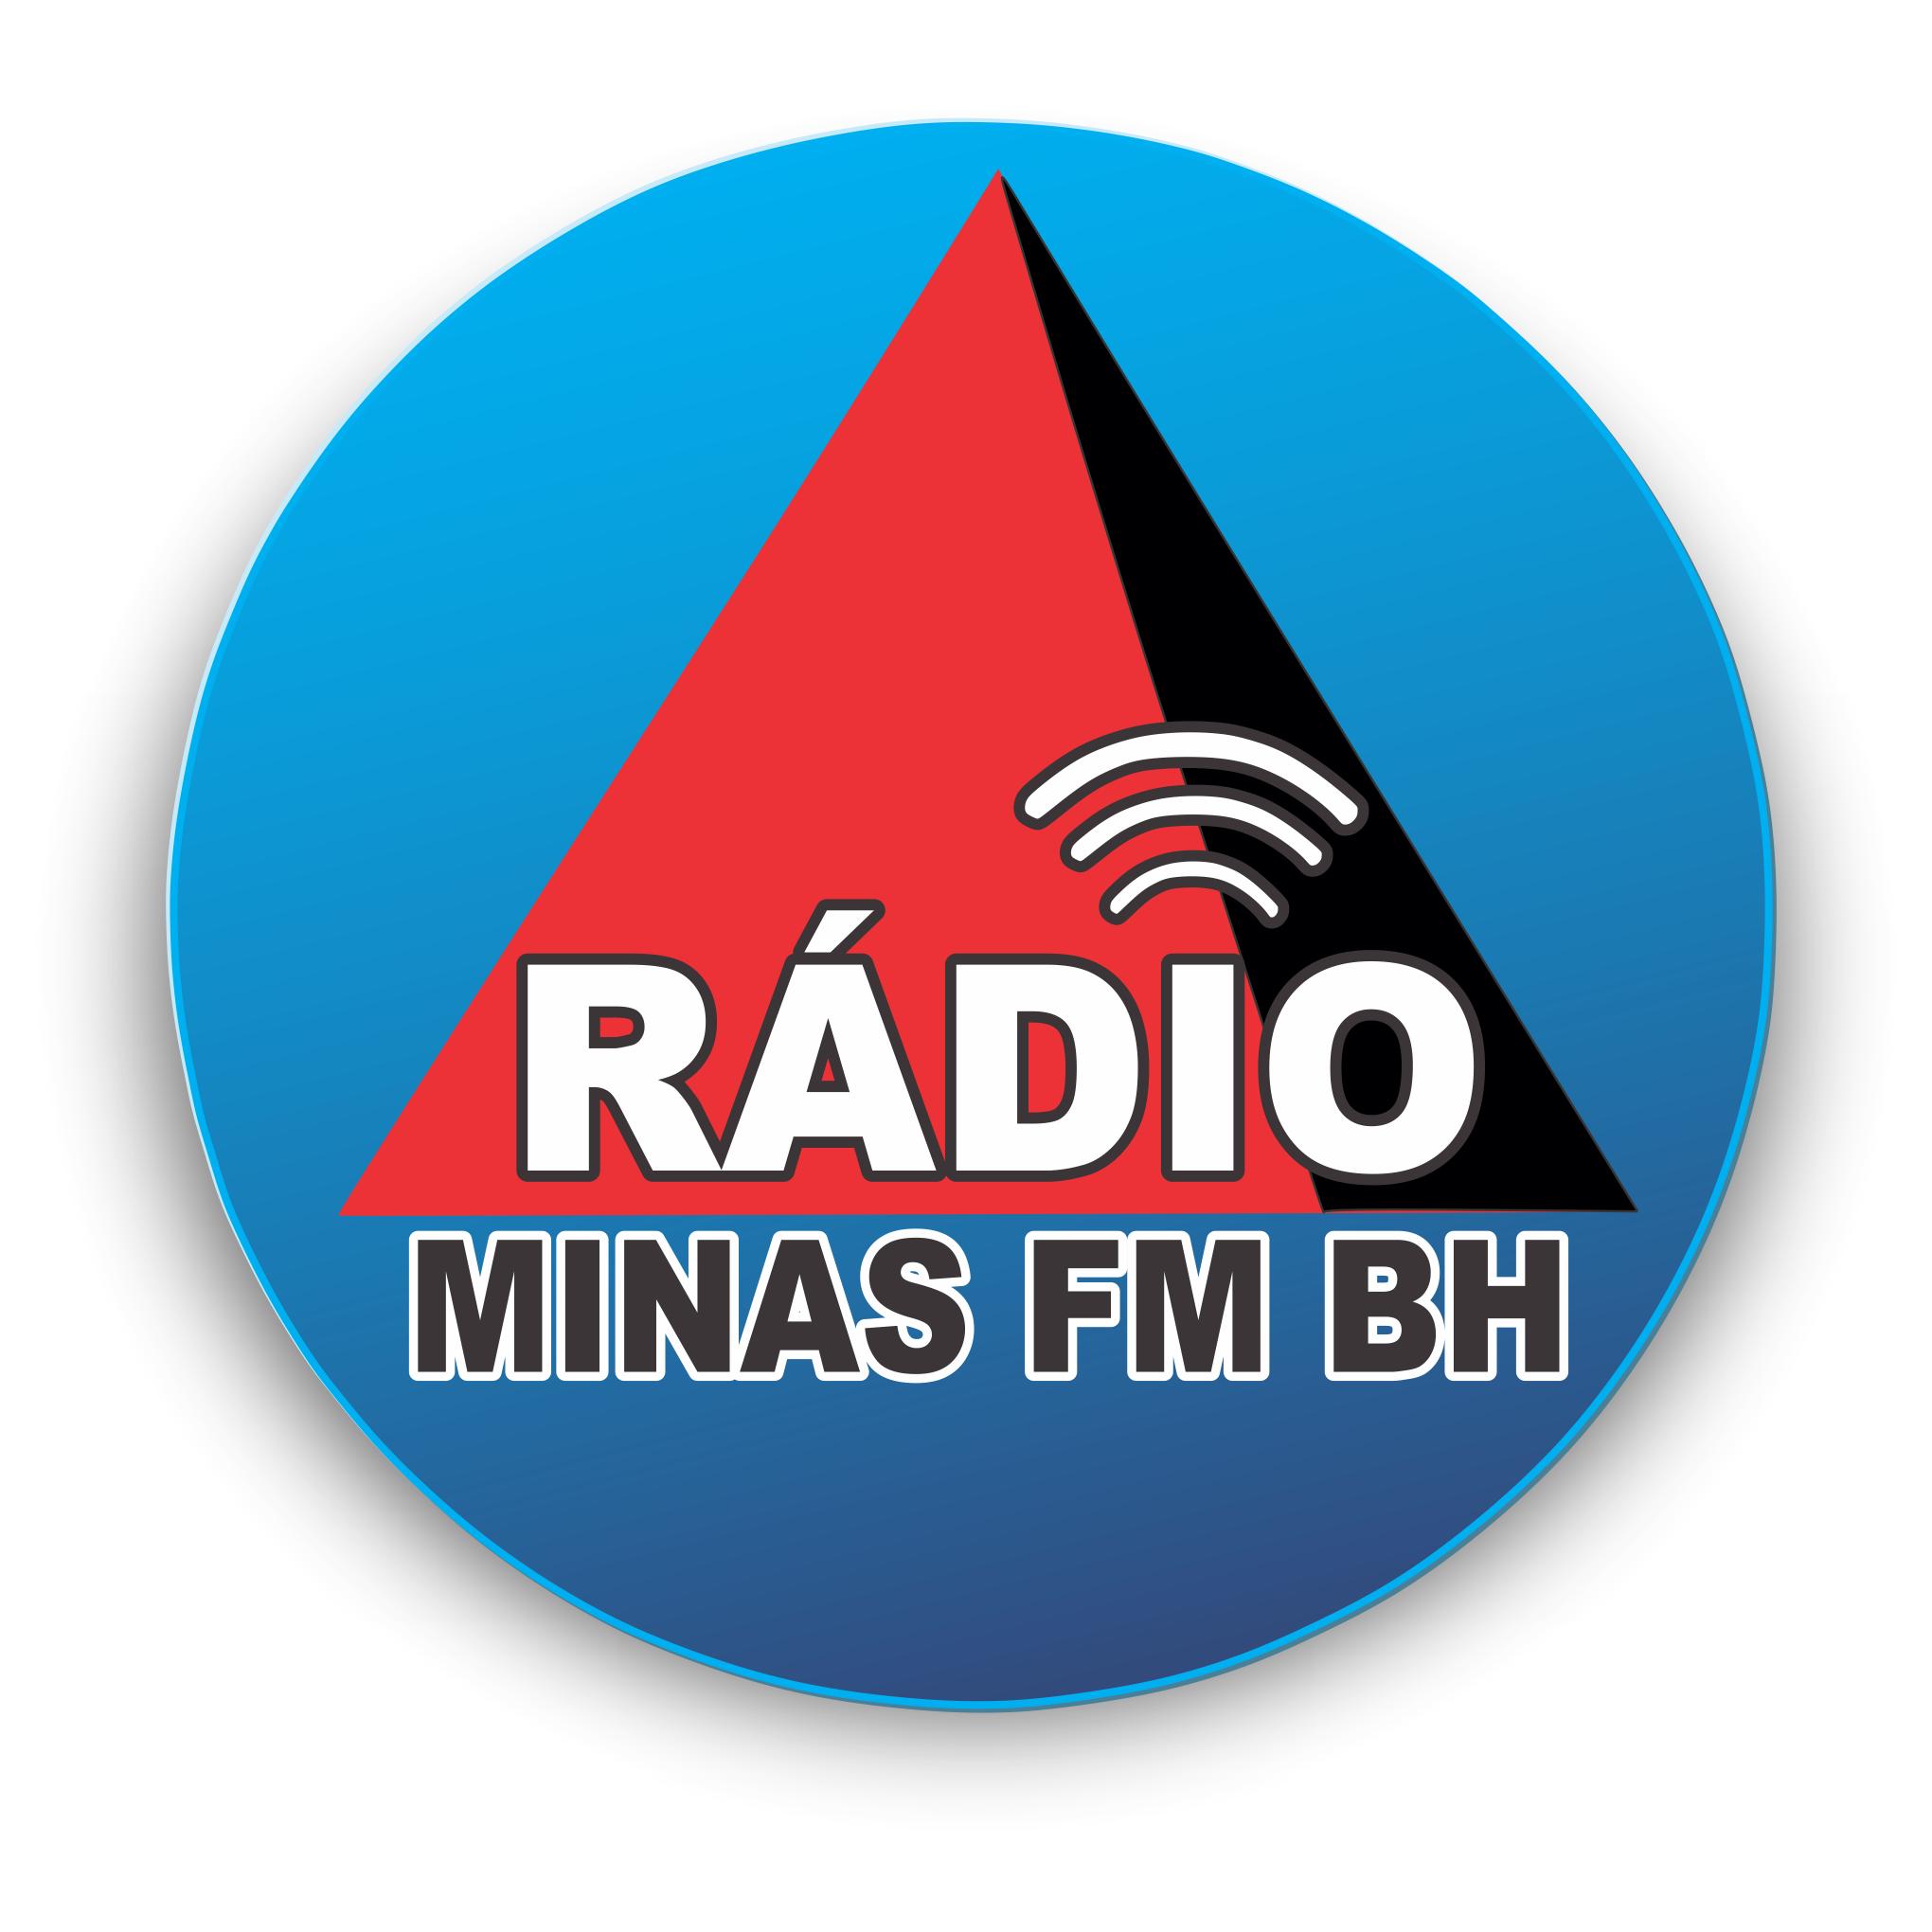 RADIO MINAS FM BH